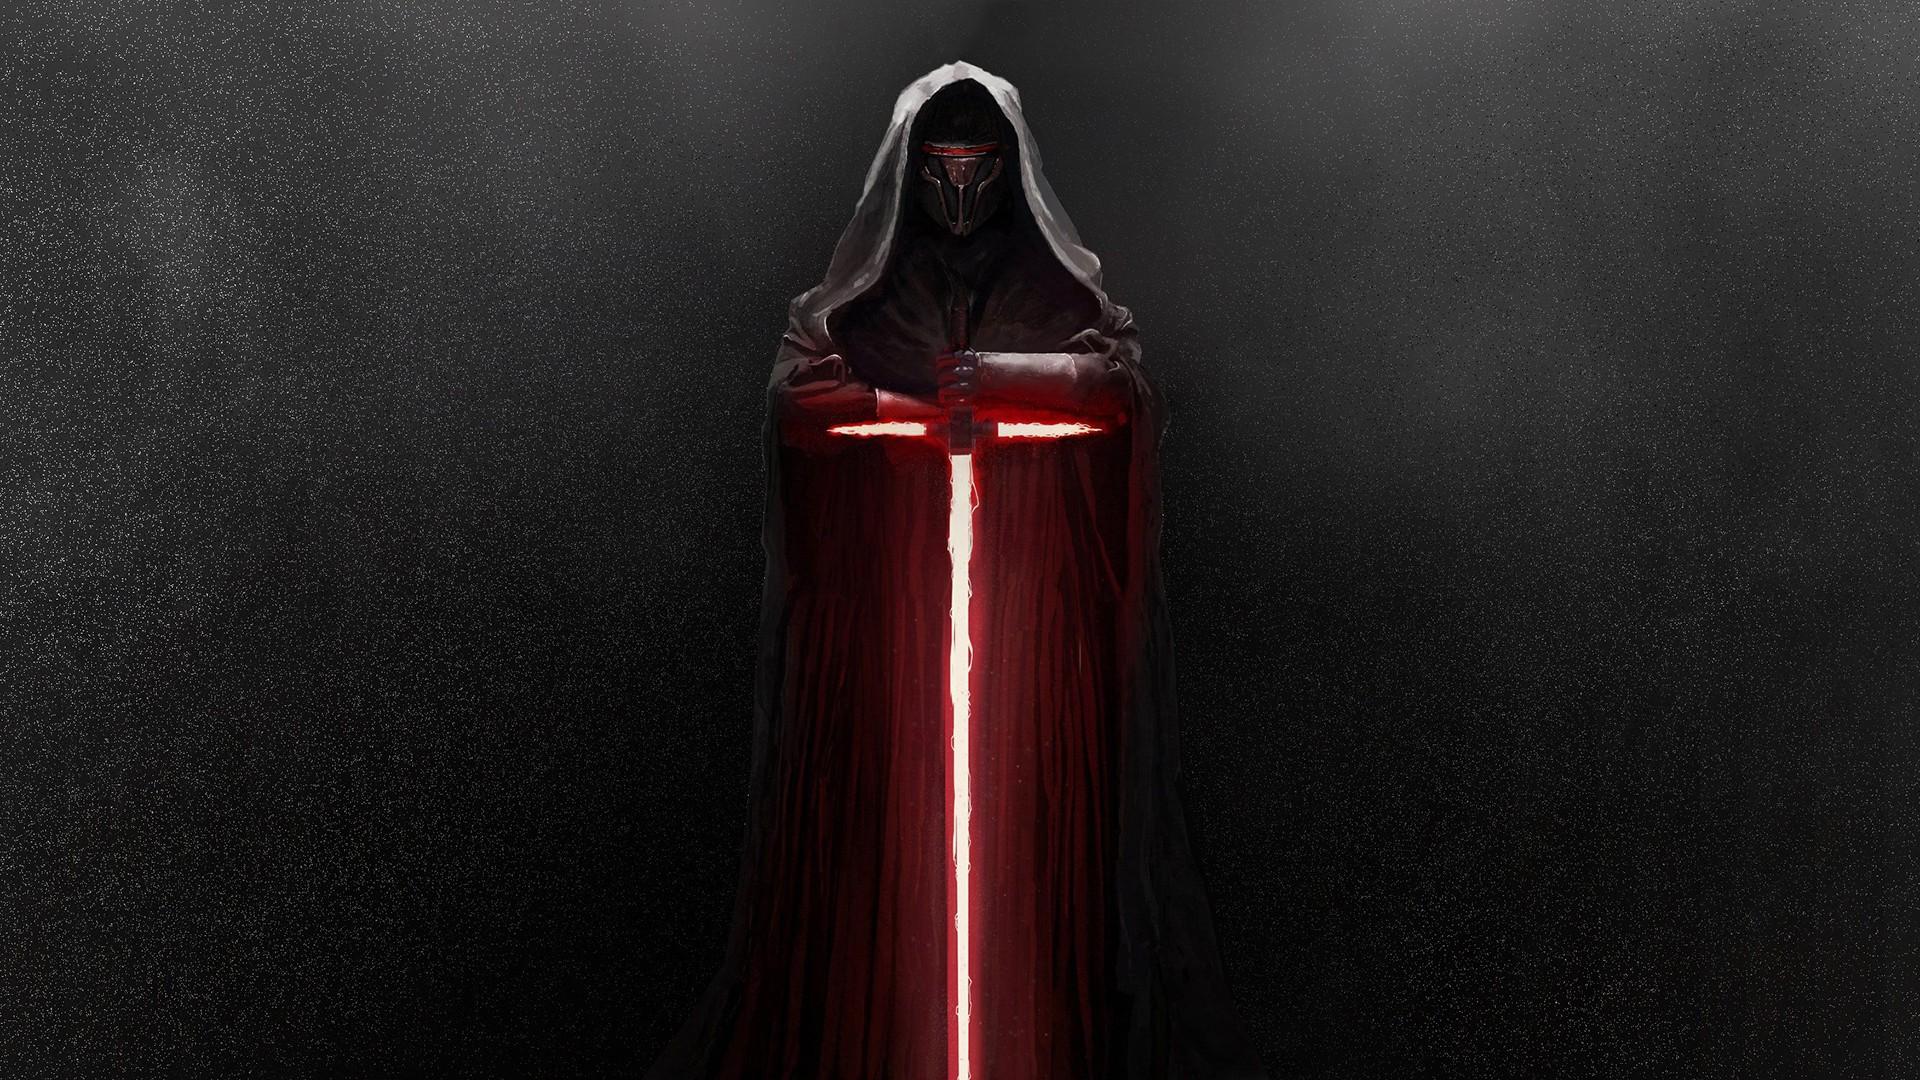 General 1920x1080 Star Wars Kylo Ren lightsaber hoods